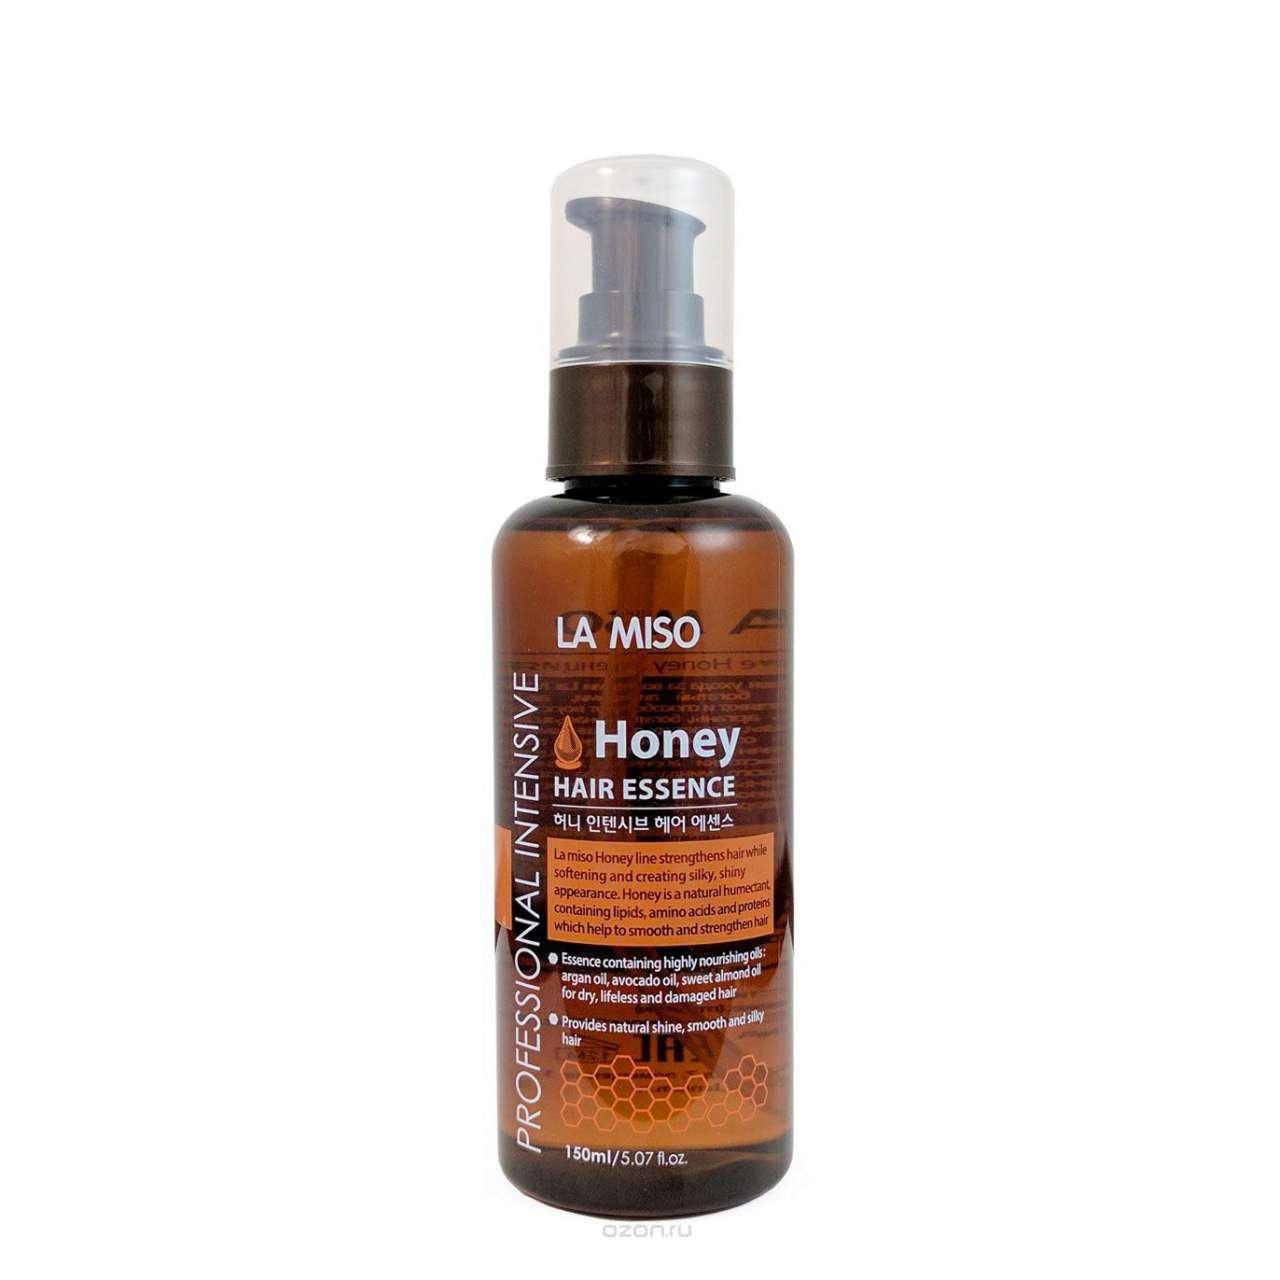 LA MISO Professional Intensive Honey Эссенция для волос